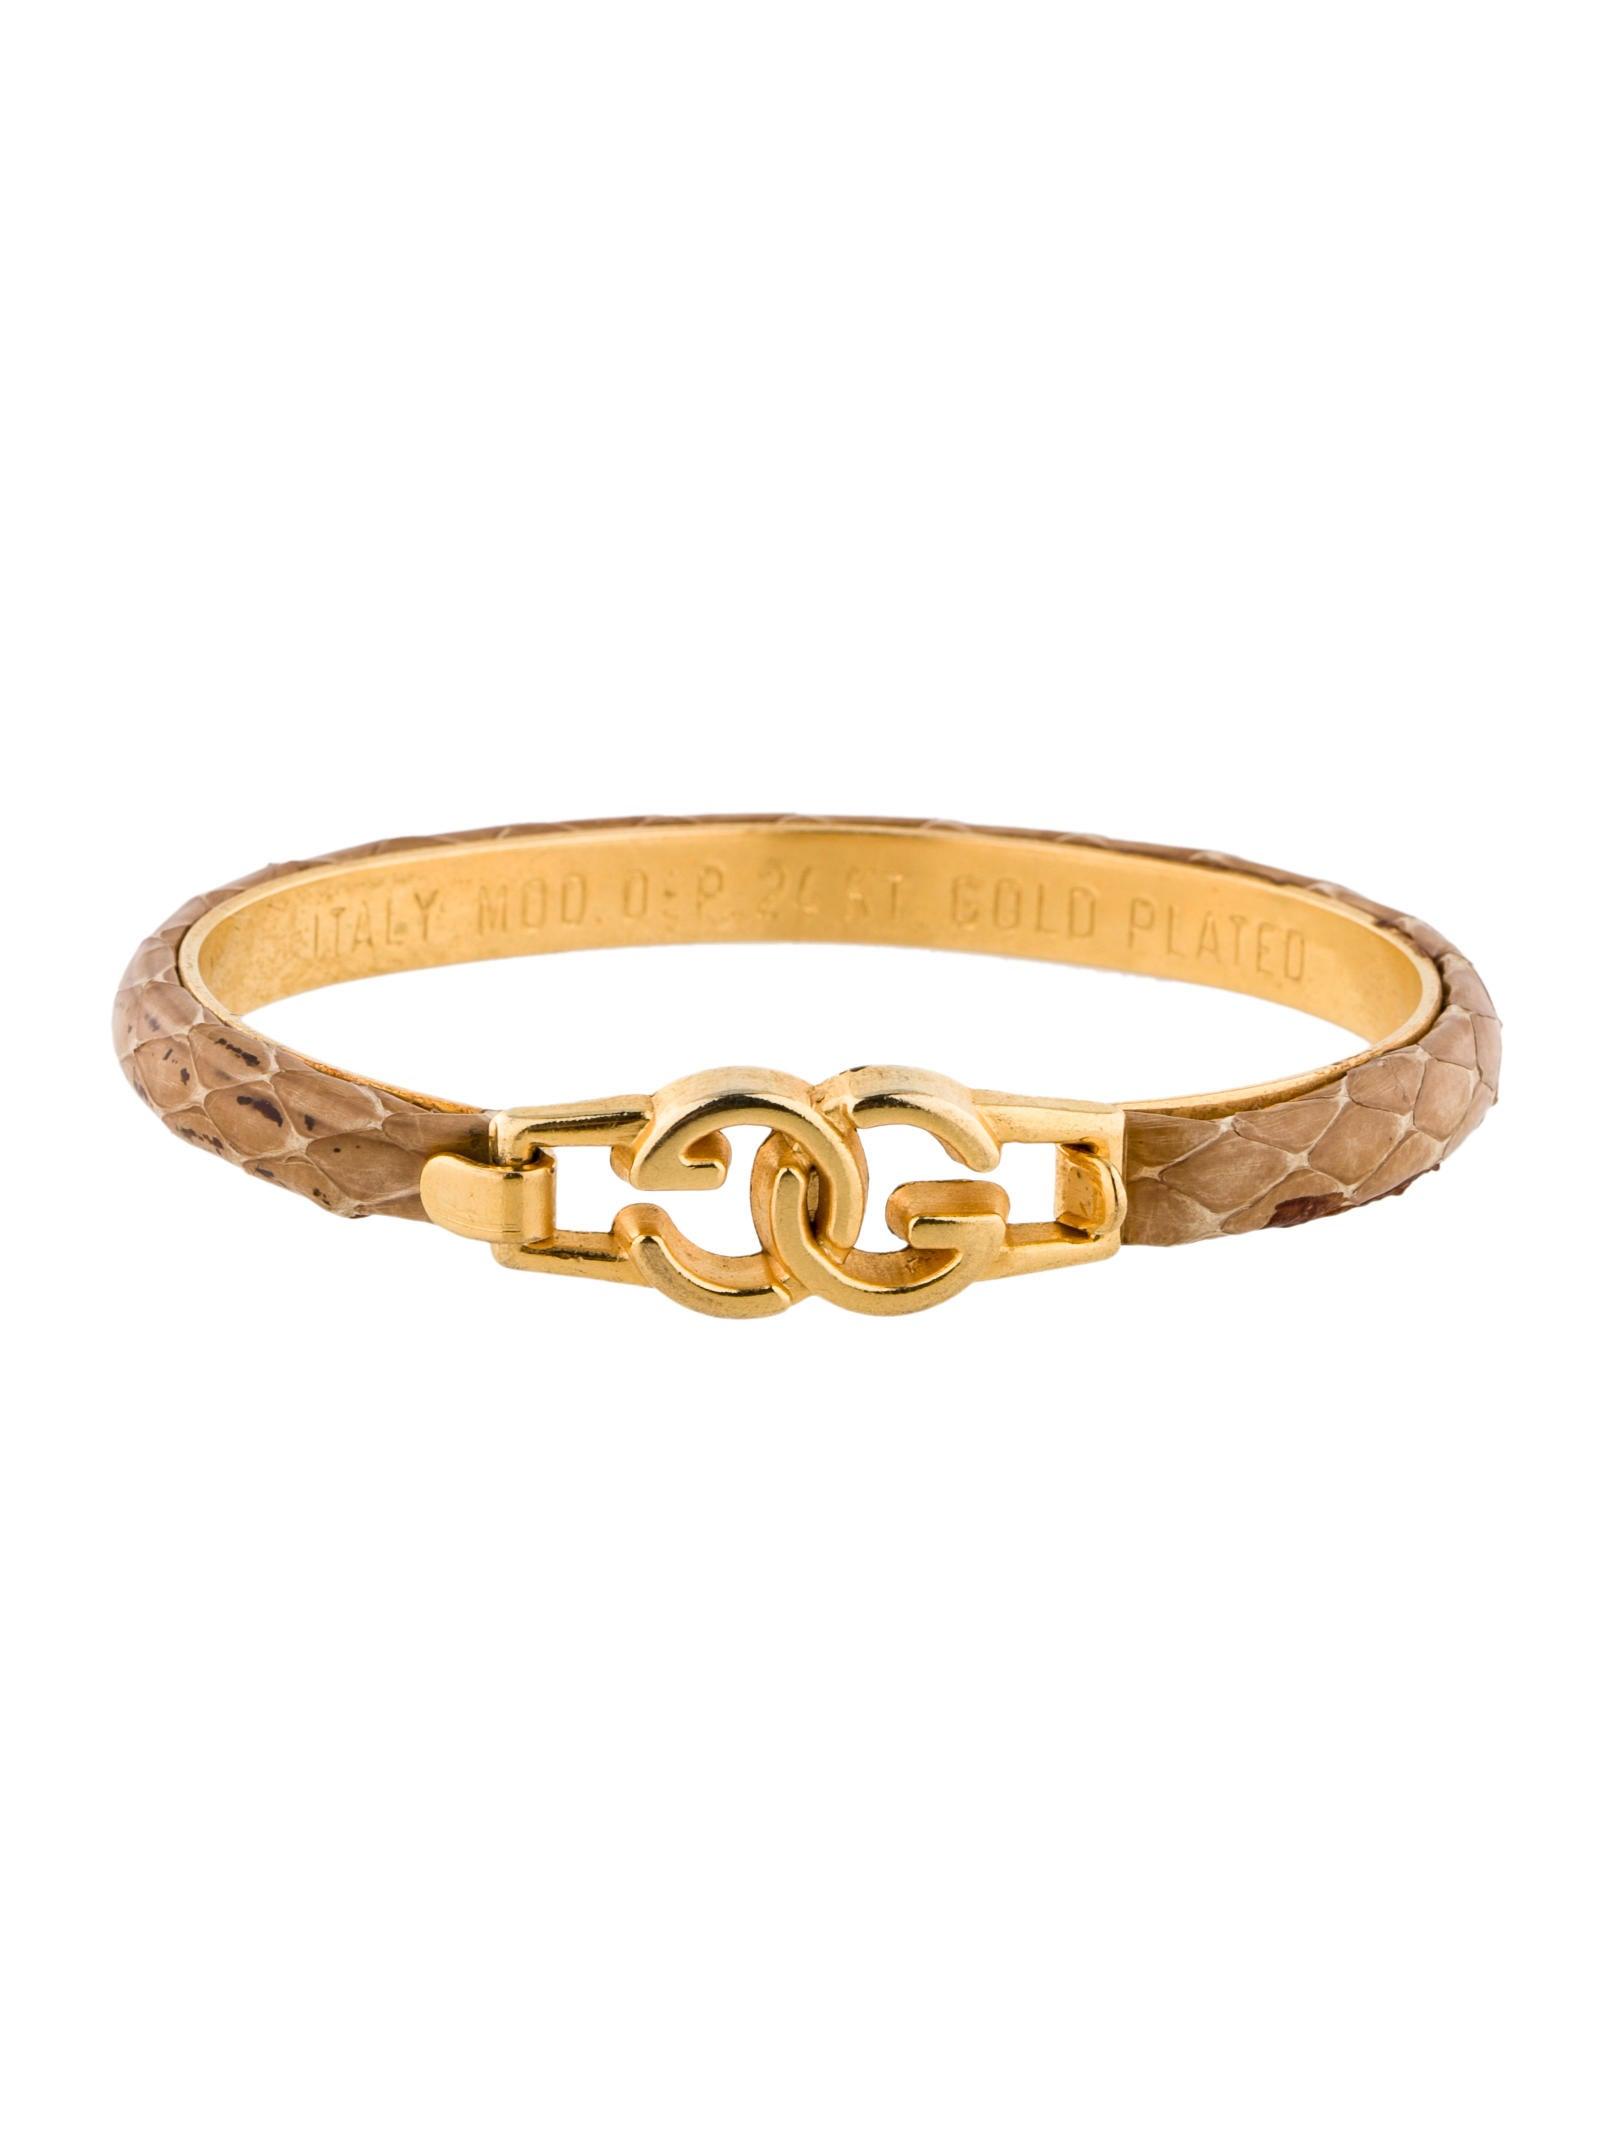 c28056bdf Gucci Snakeskin Bracelet - Bracelets - GUC56873 | The RealReal